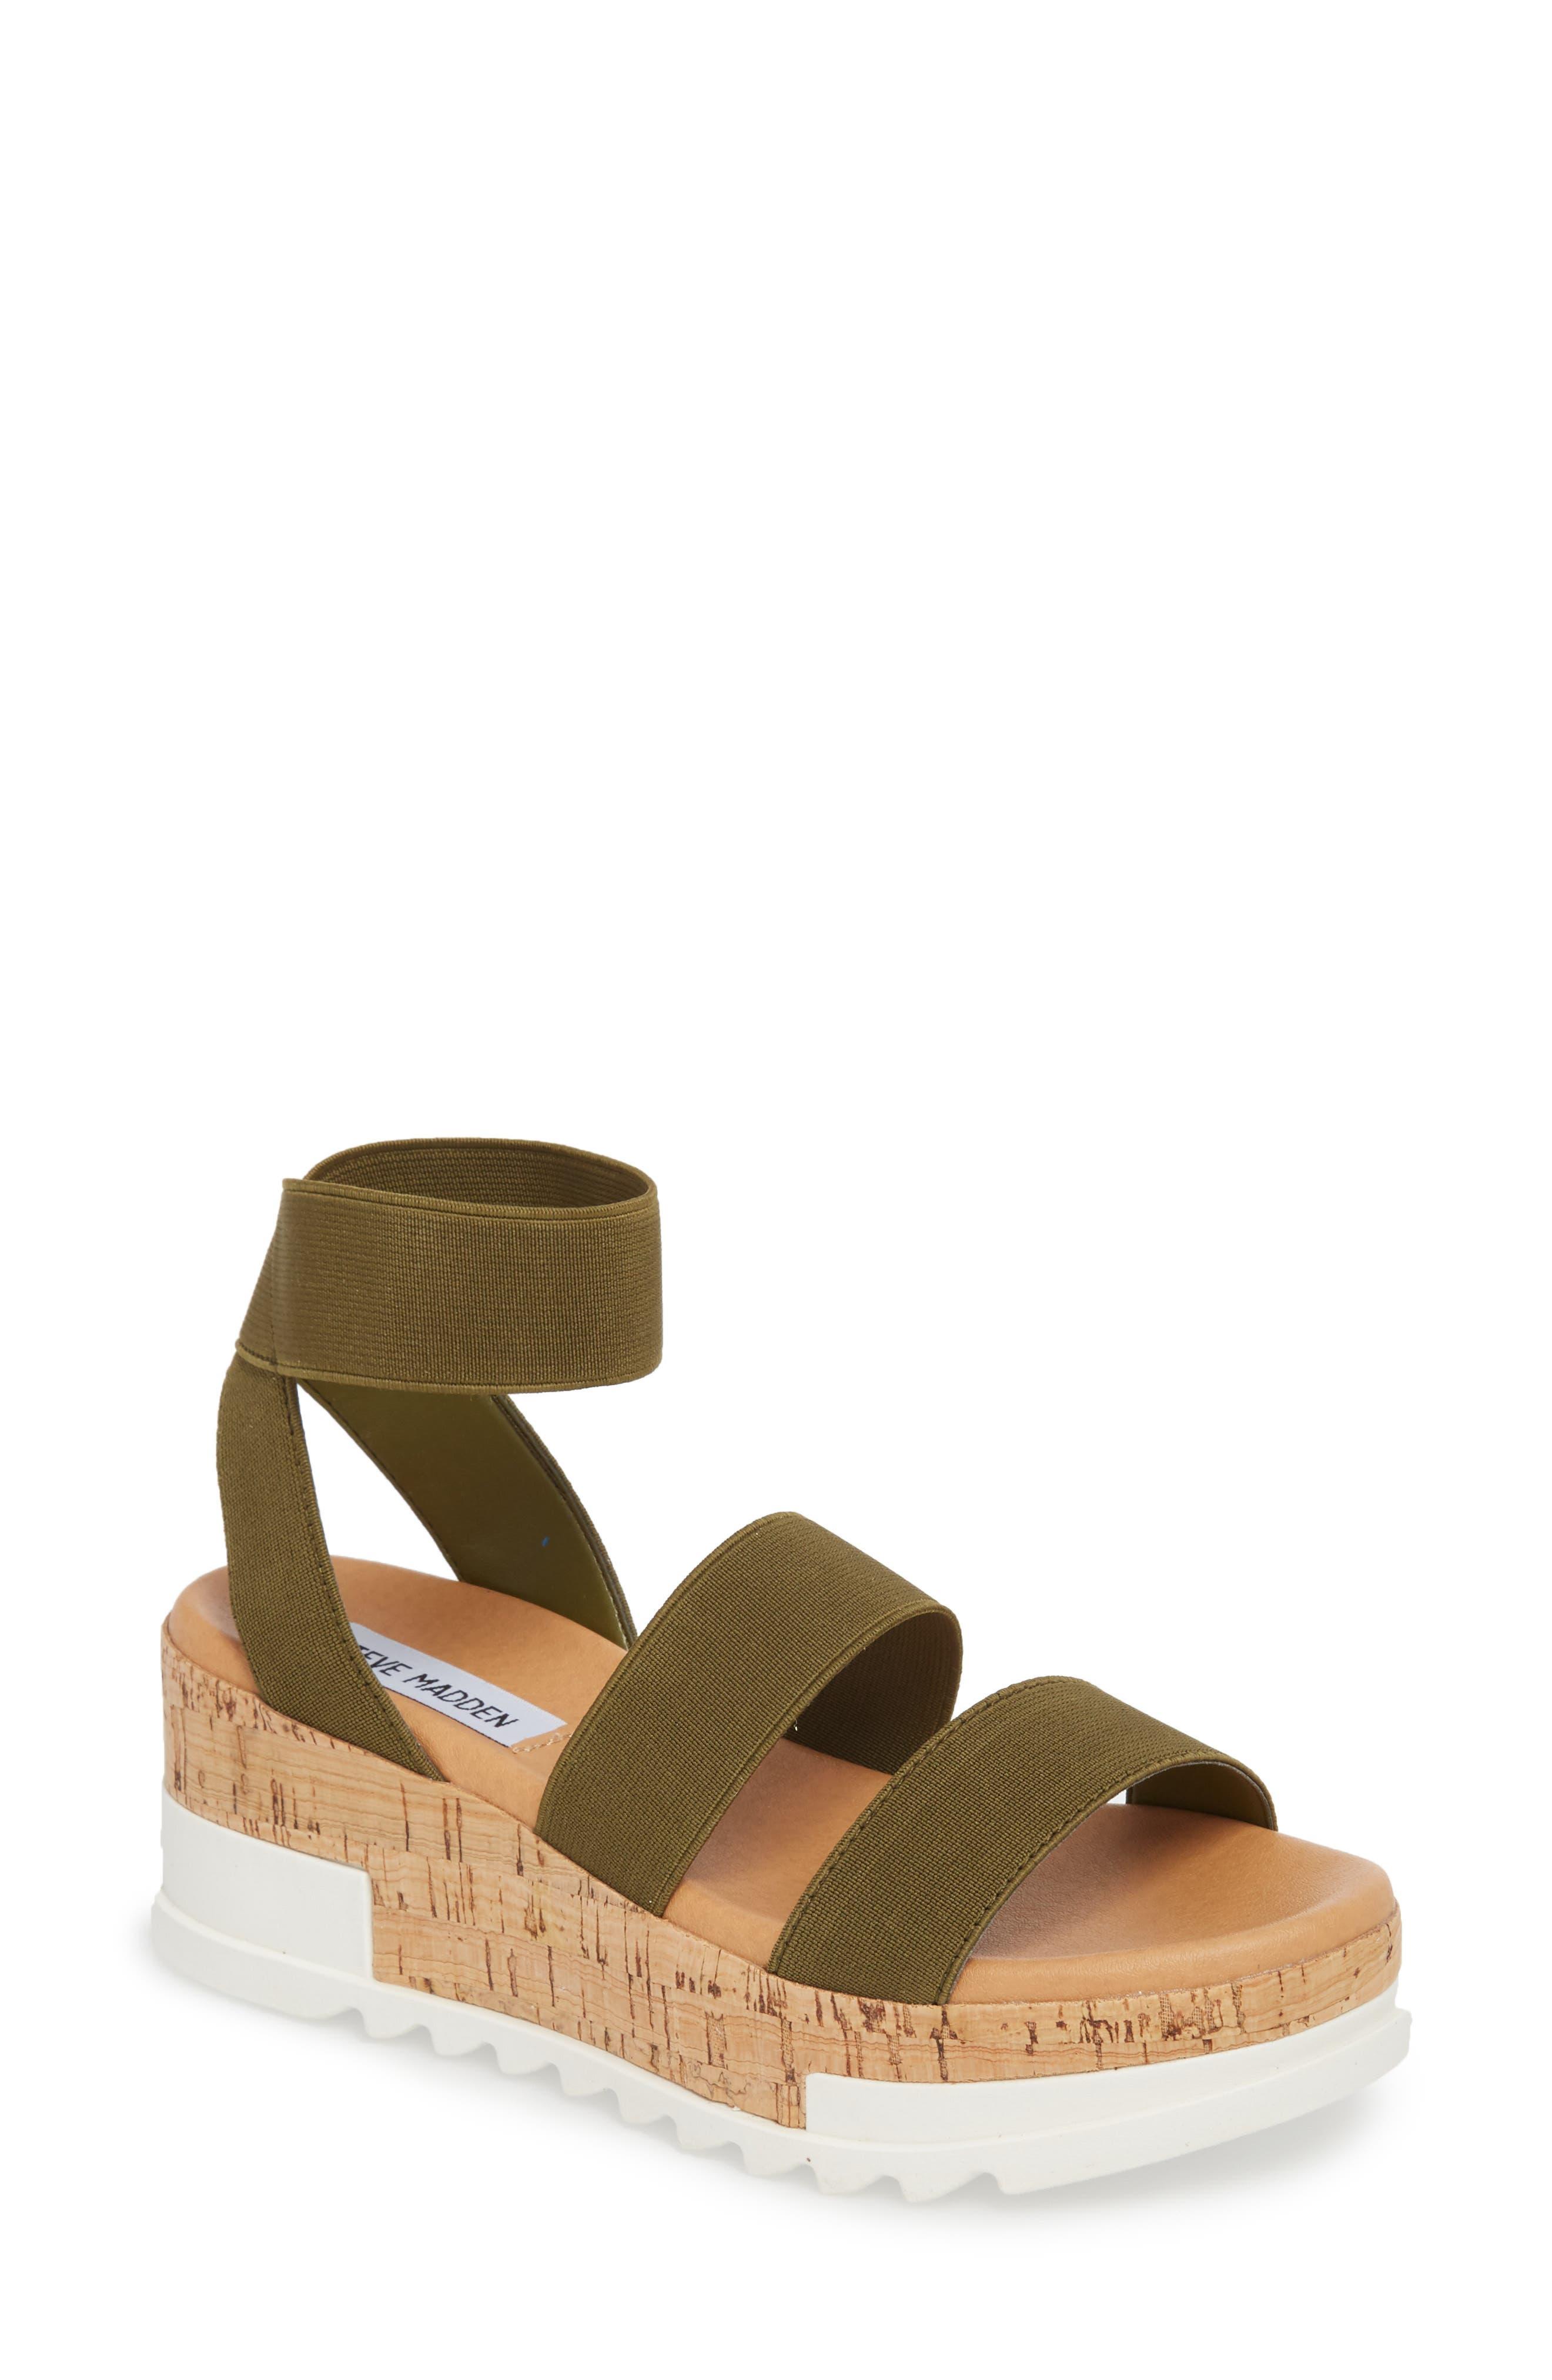 STEVE MADDEN, Bandi Platform Wedge Sandal, Main thumbnail 1, color, OLIVE